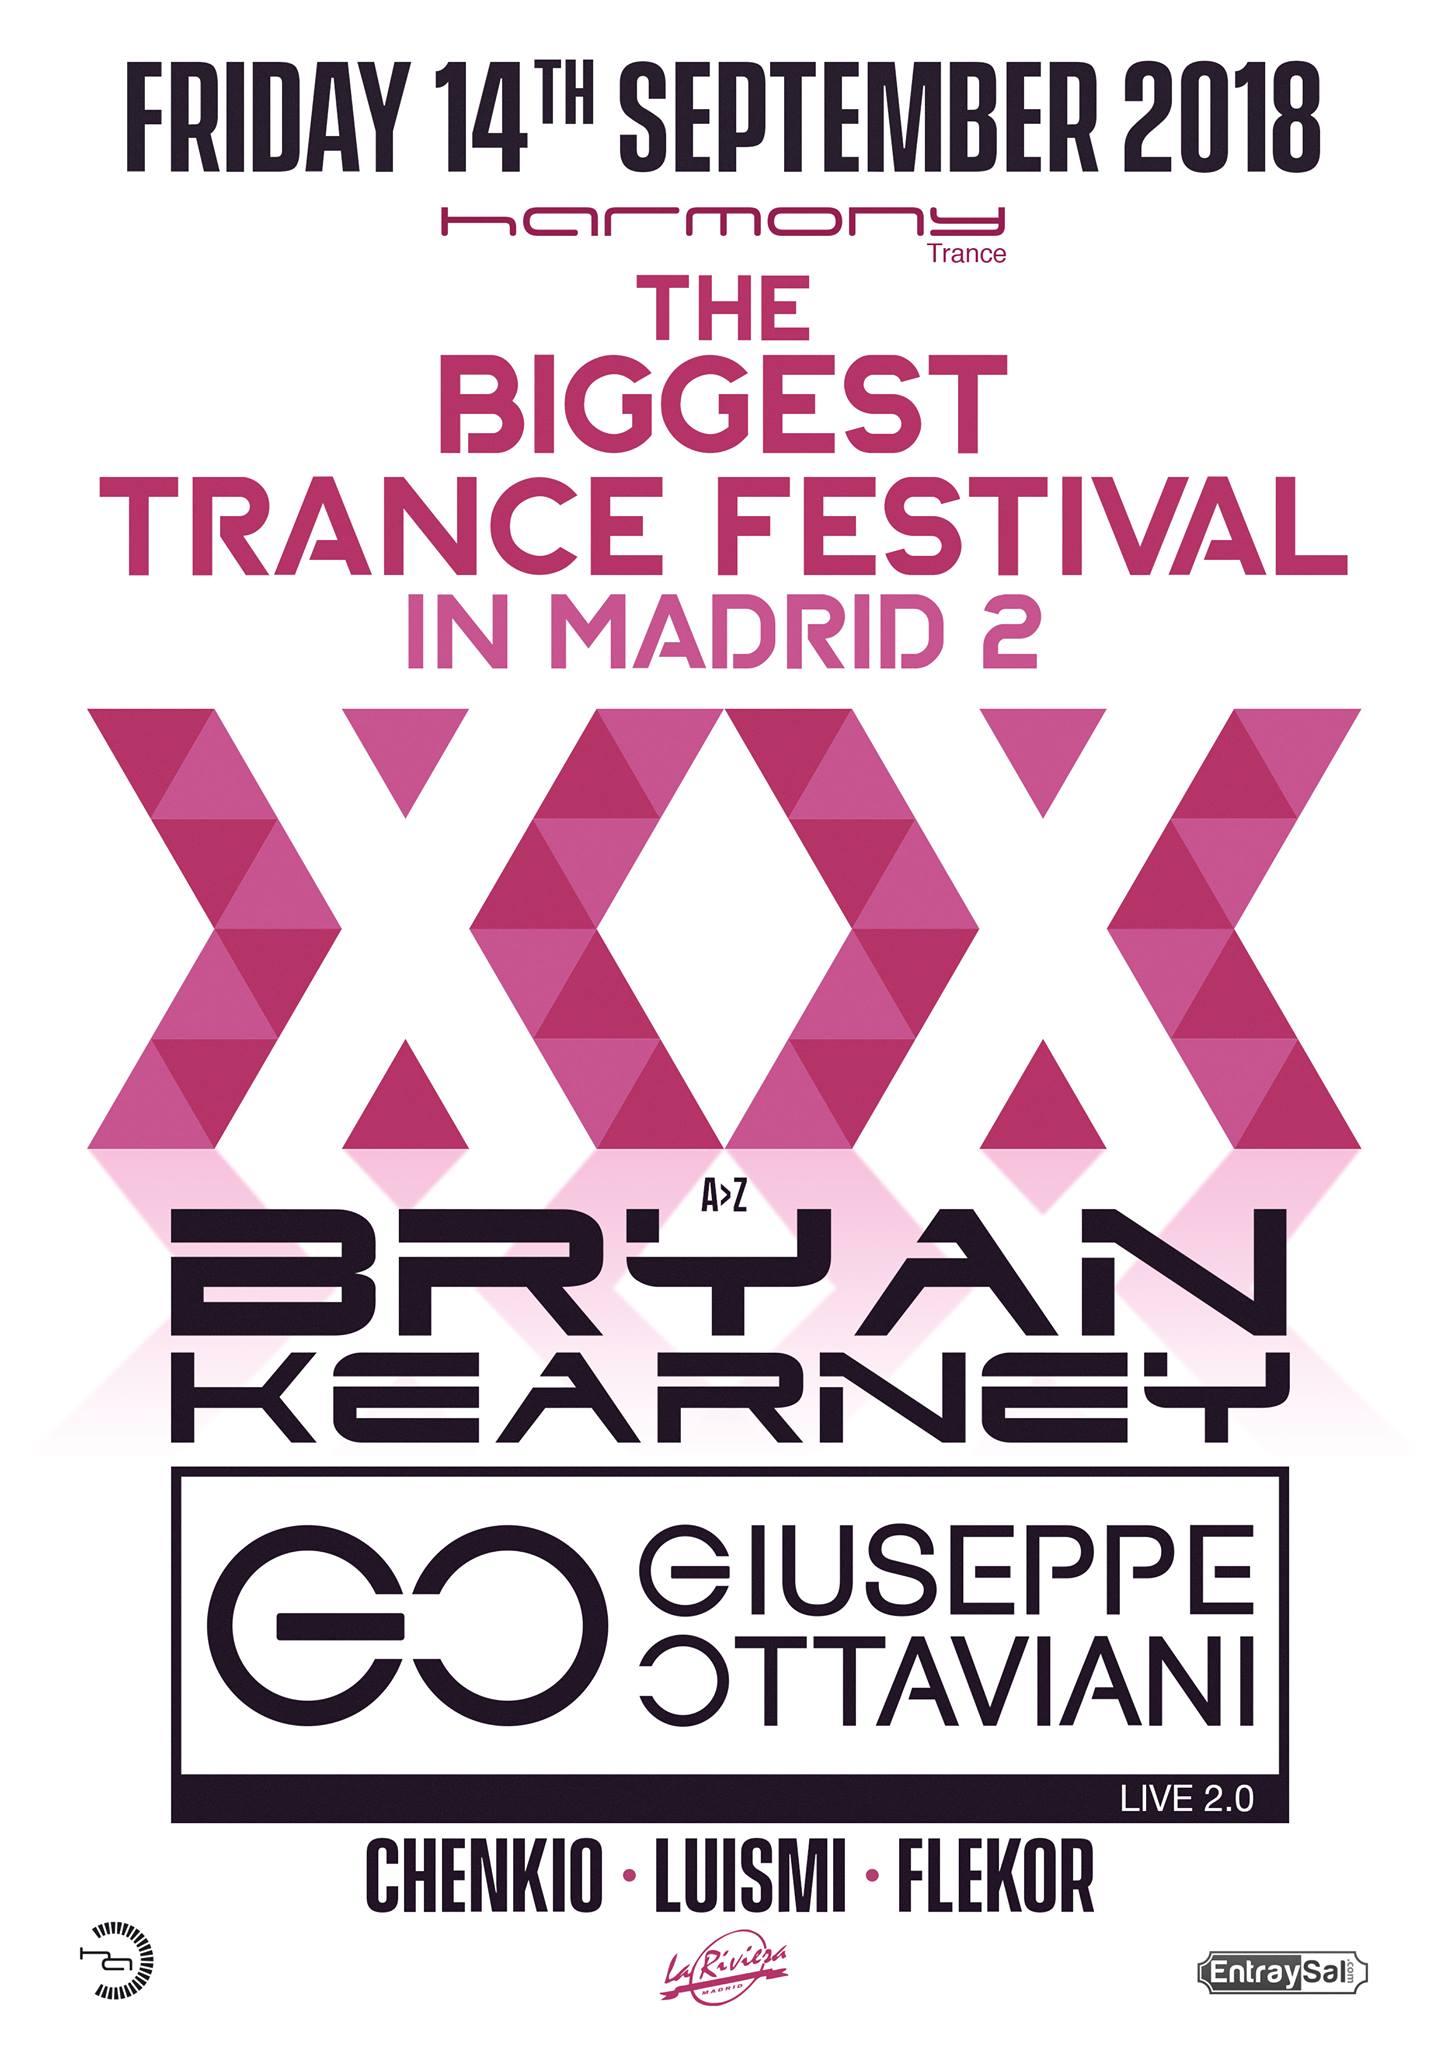 Nueva Harmony a lo grande: The Biggest Trance Festival 2 con Bryan Kearney y Giuseppe Ottaviani